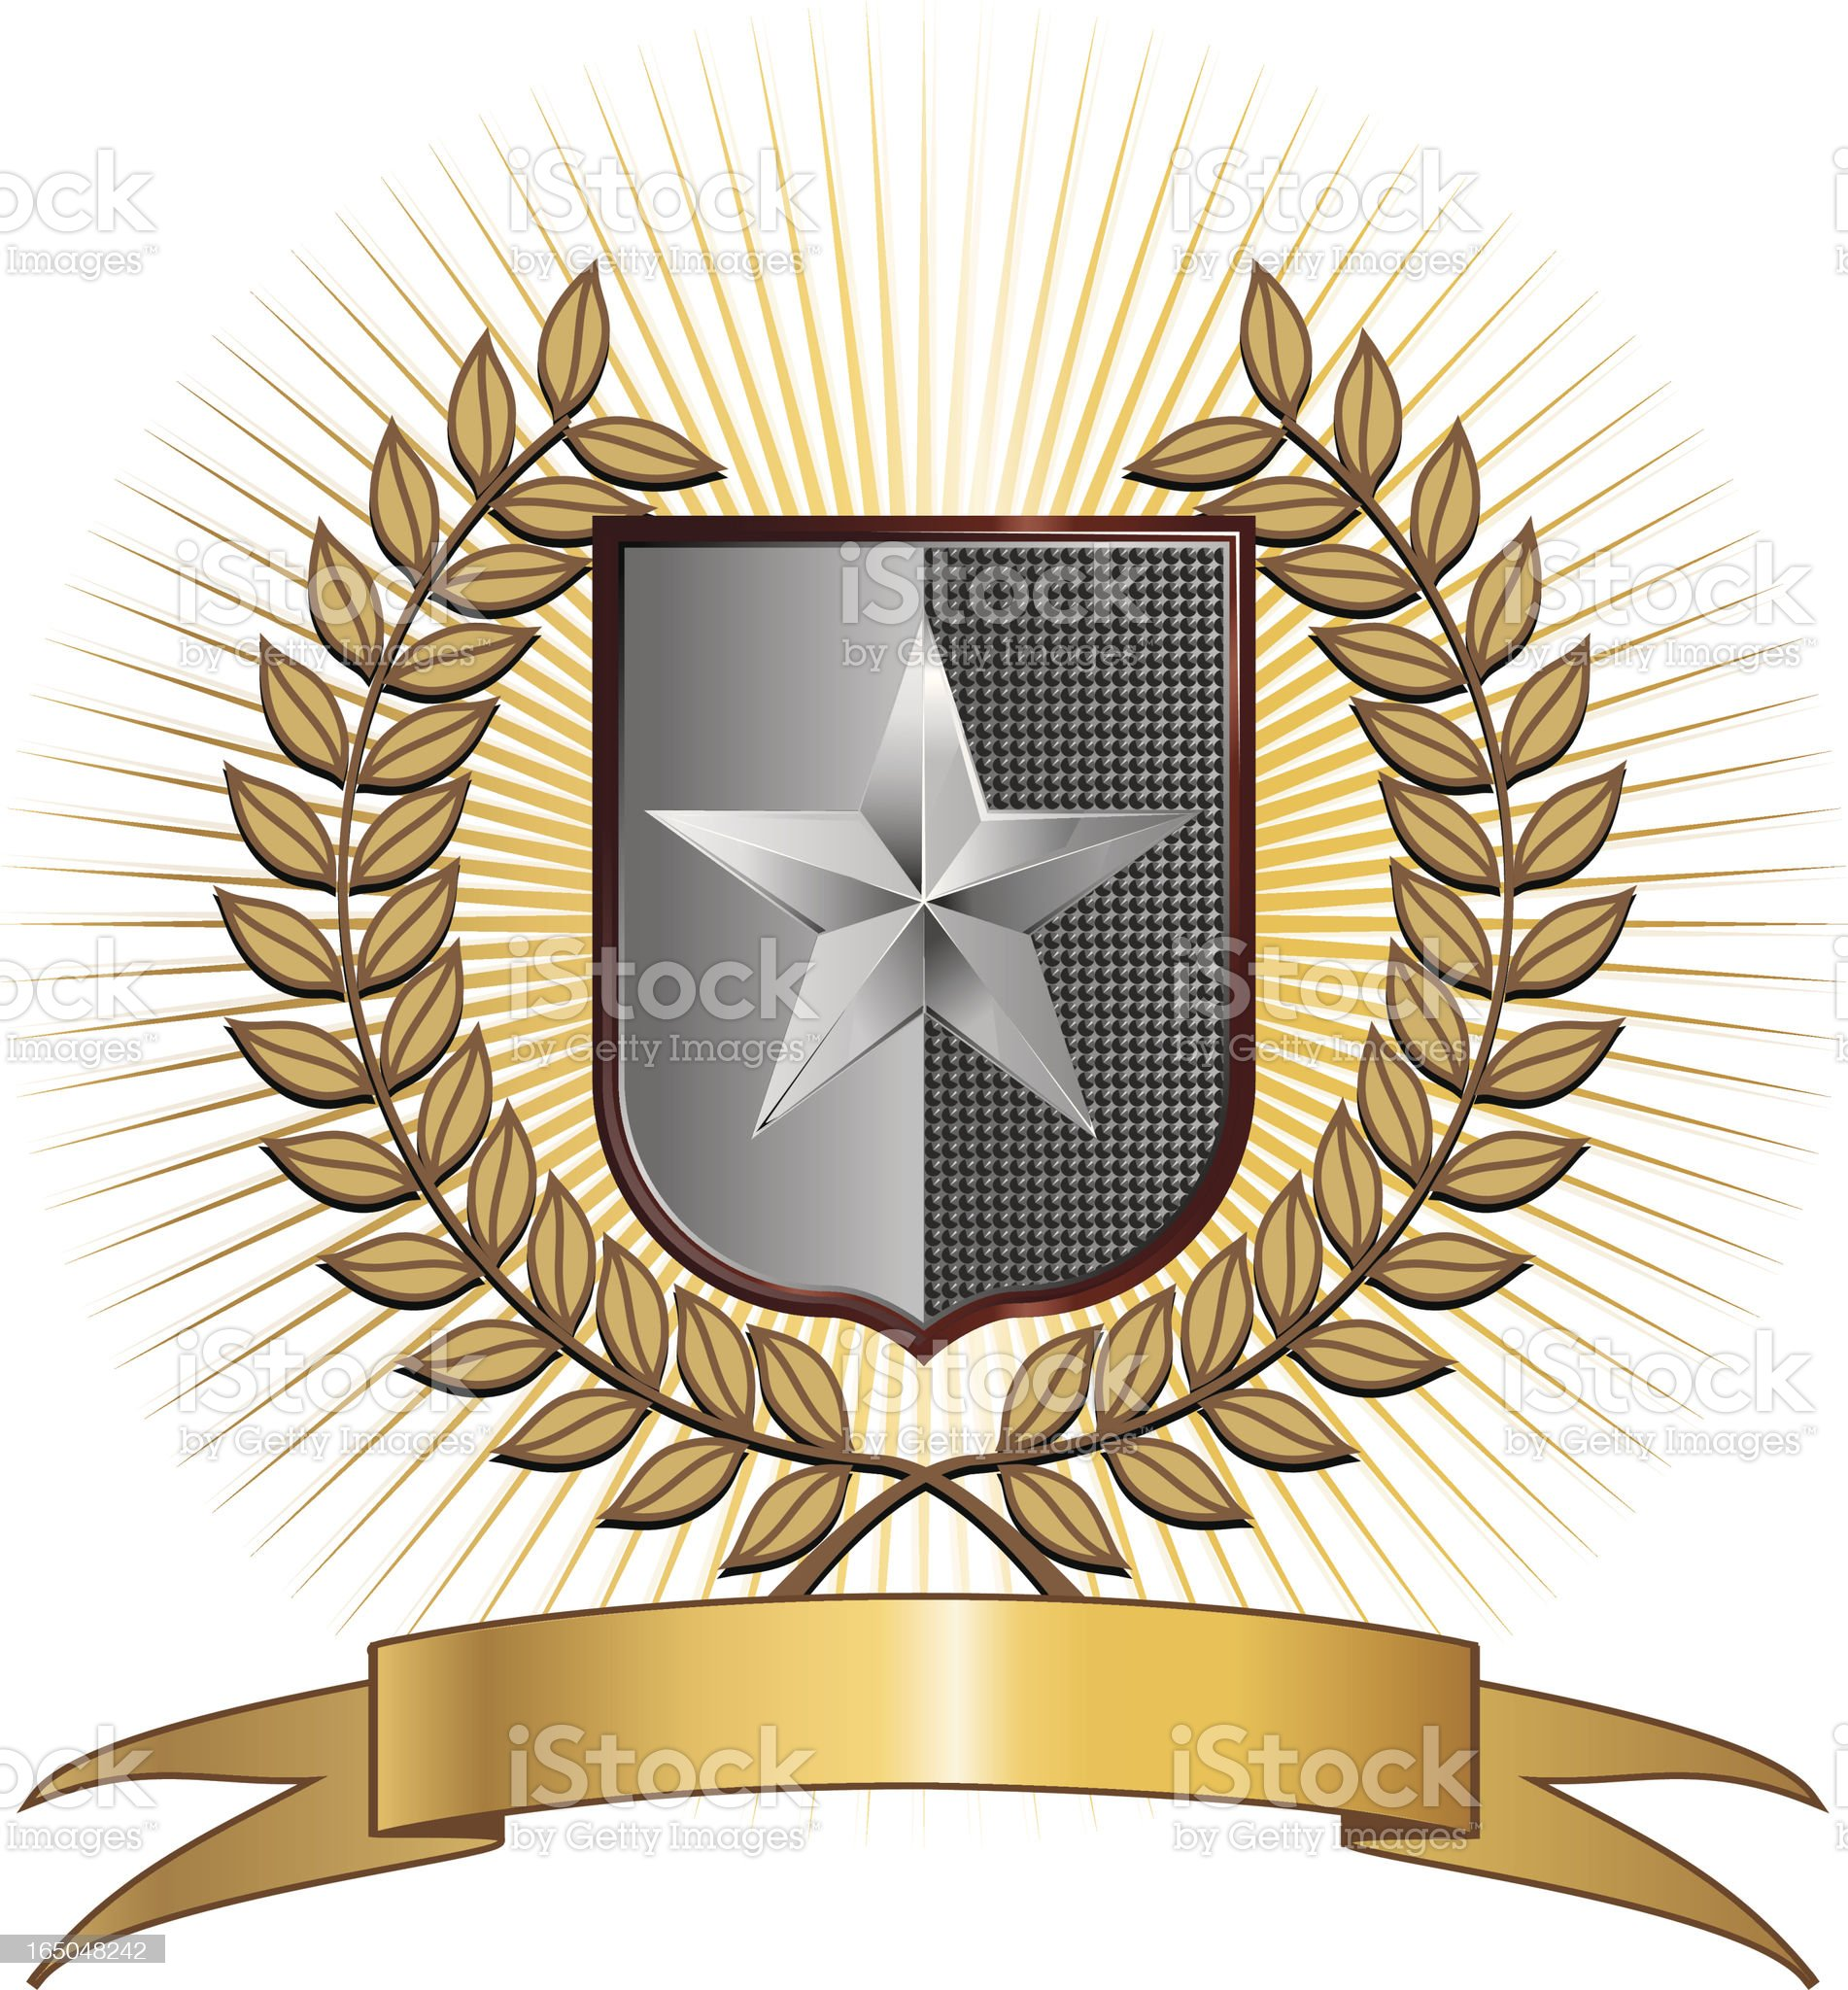 Star badge with laurel wreath royalty-free stock vector art